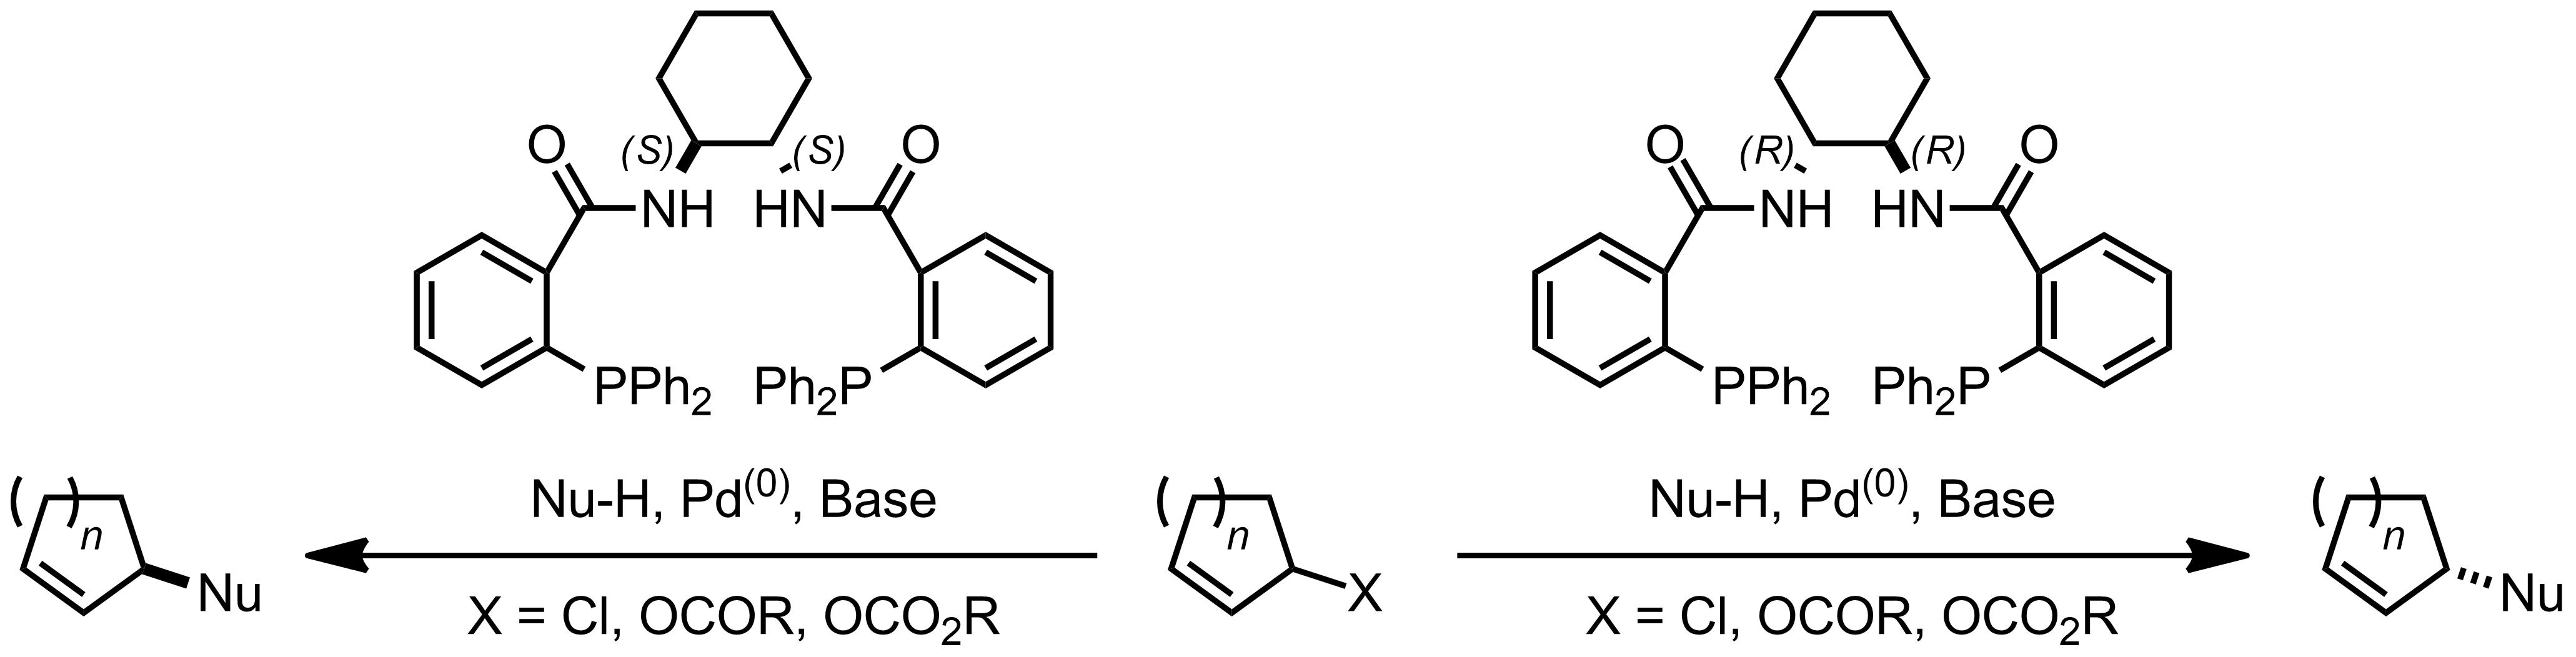 Schematic representation of the Trost Asymmetic Allylation Alkylation.